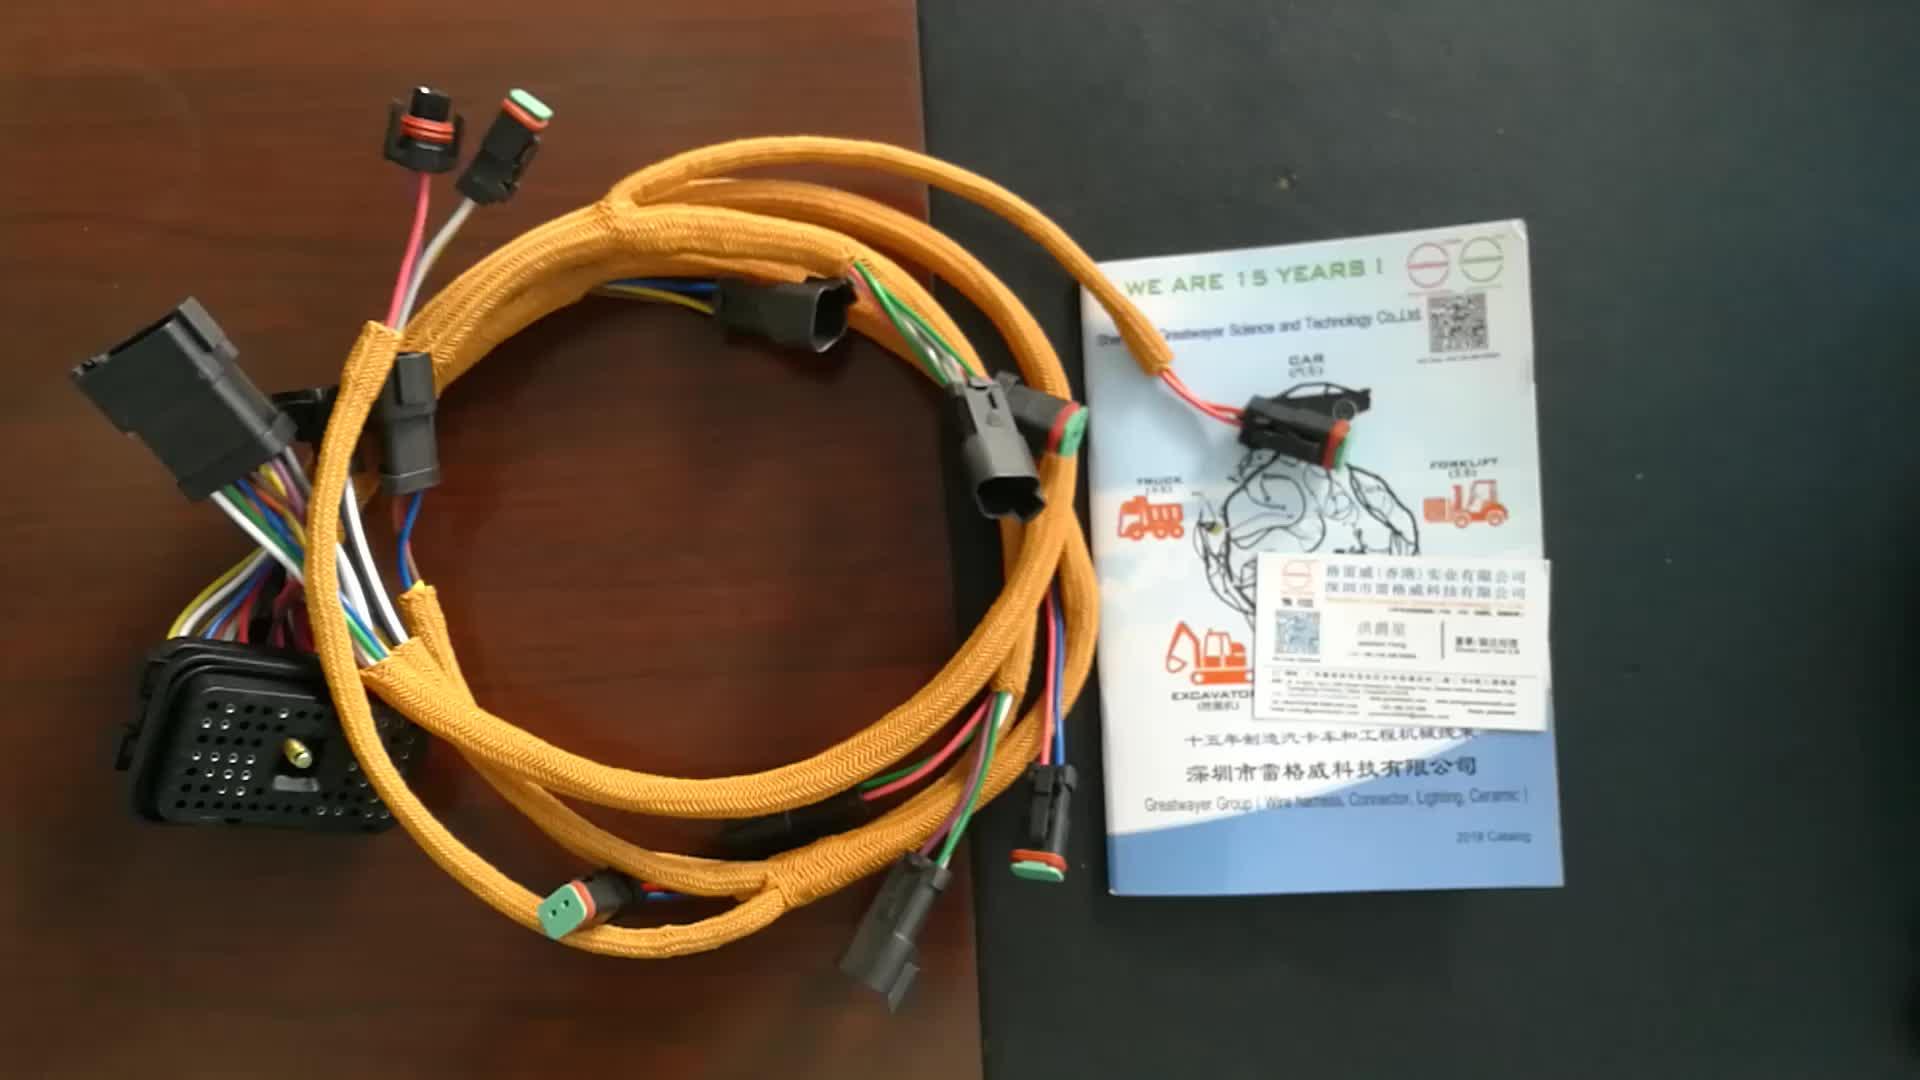 Cat Ecm Pin Wiring Diagram Further Cat Ecm Pin Wiring Diagram Also C15